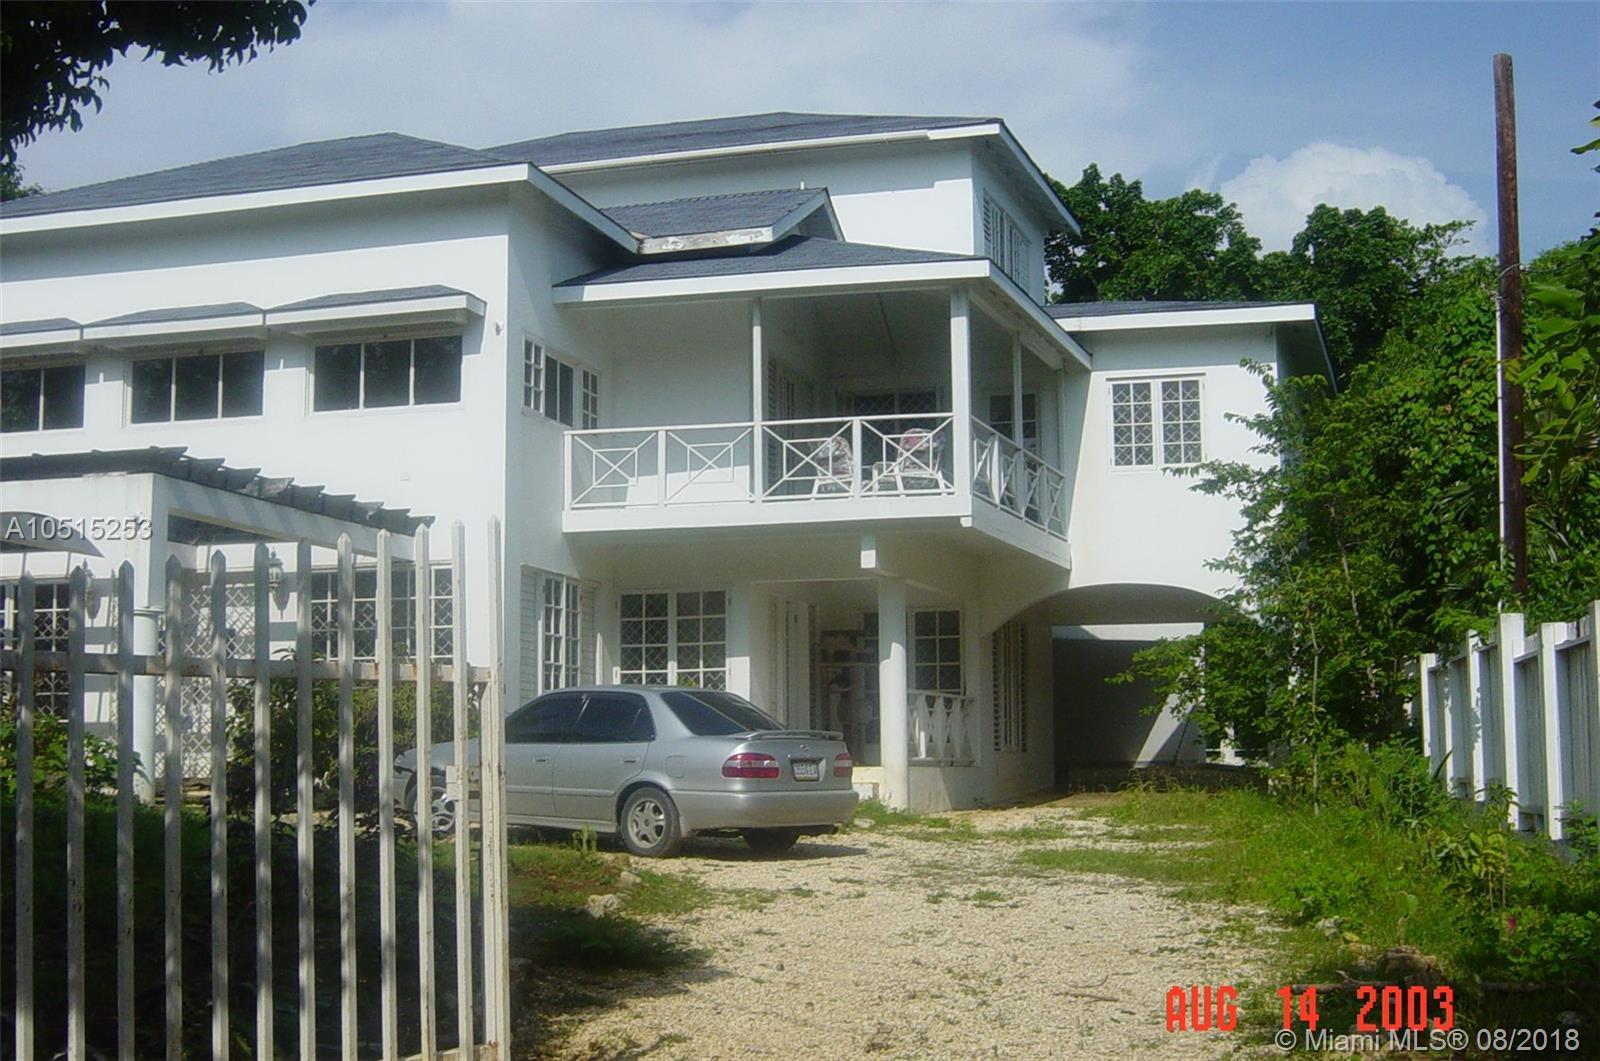 0000000 Real Estate Listings Main Image